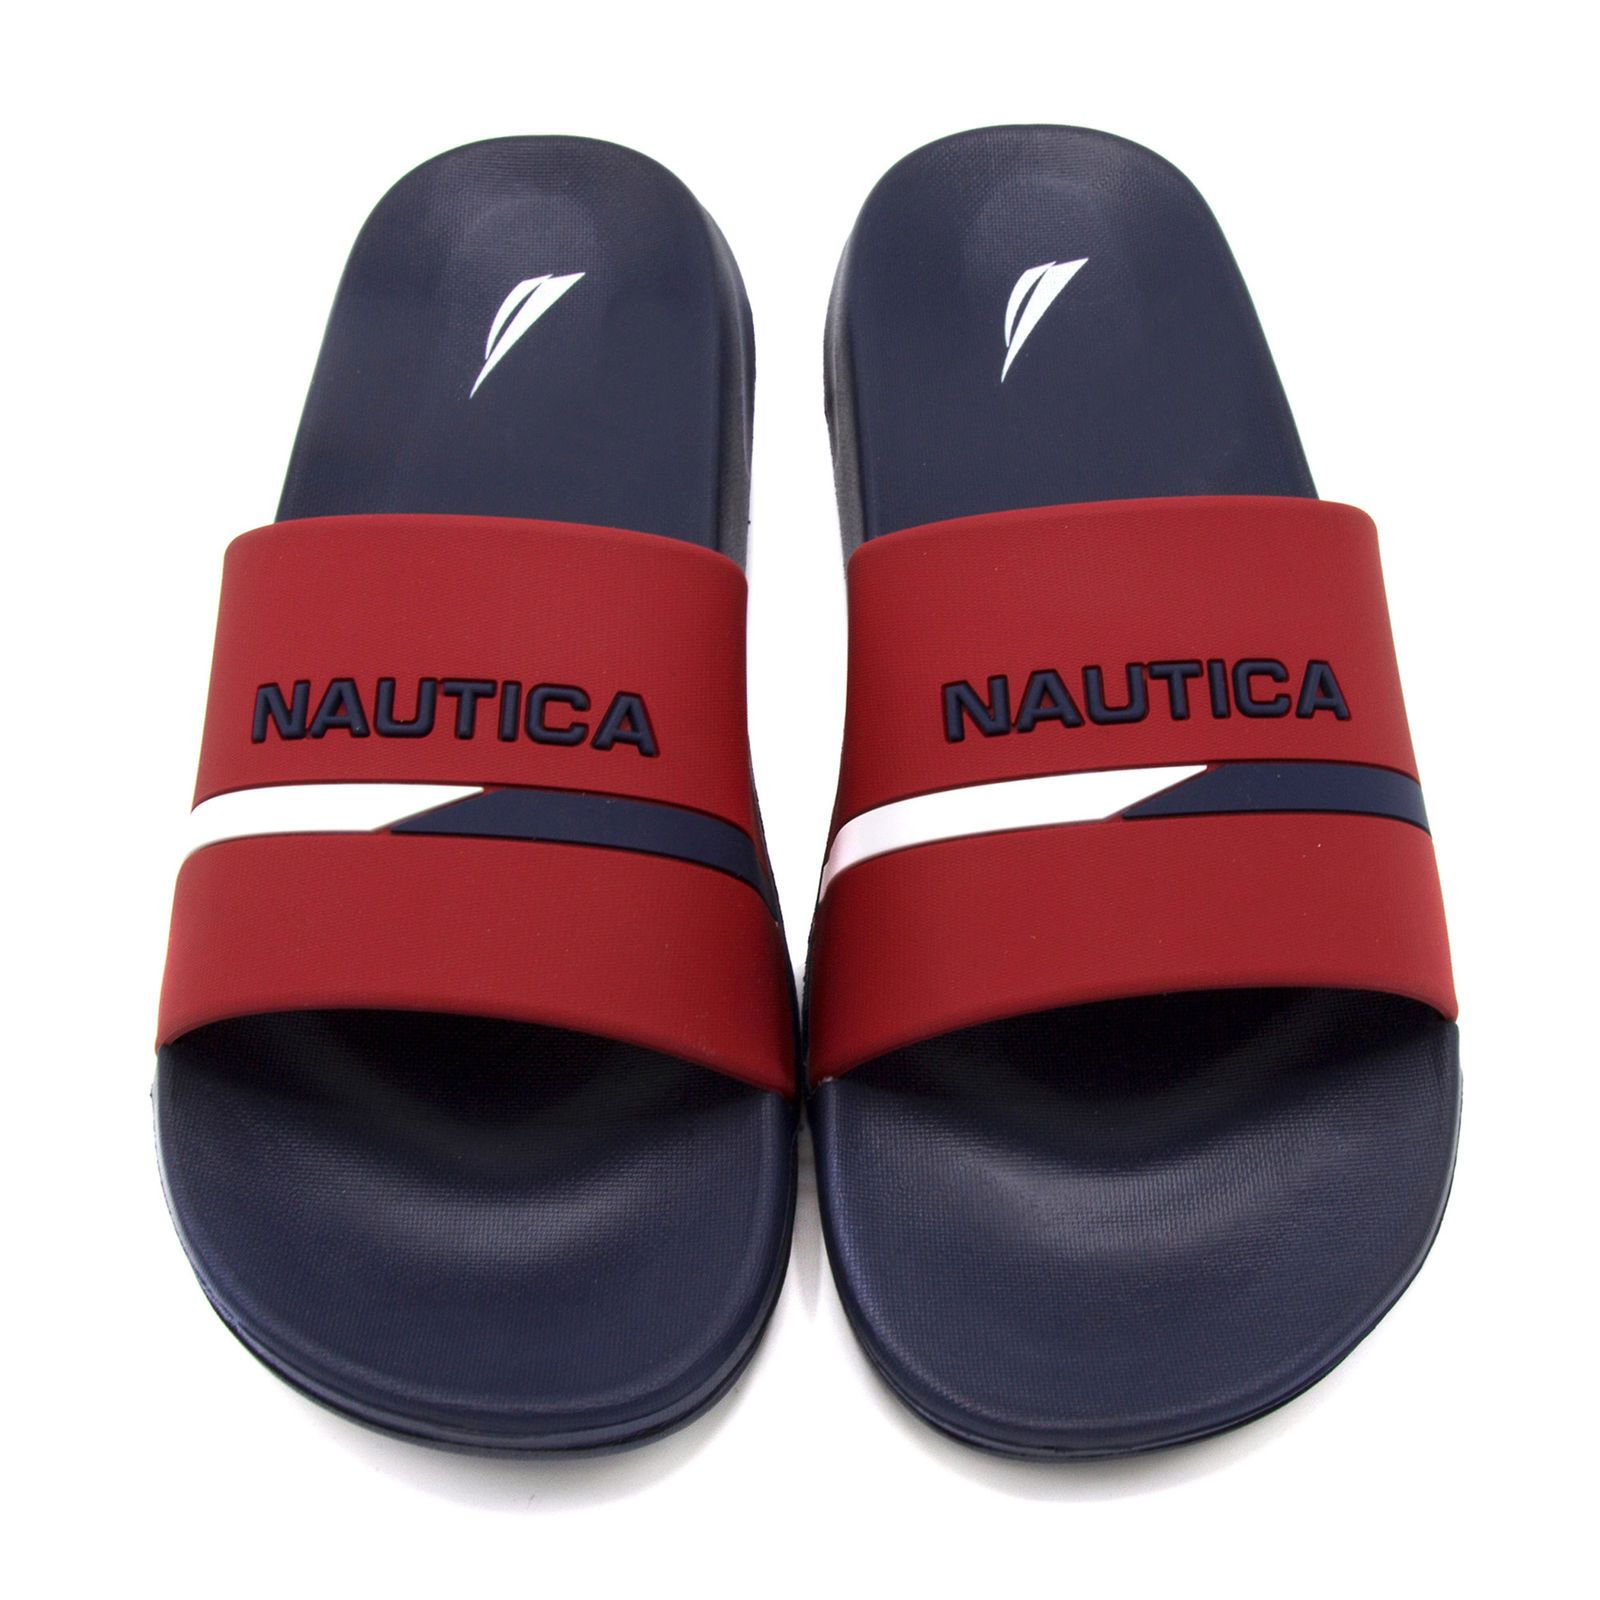 2859b50e9c3b Nautica mens stono logo slides red nautica pinterest logos jpg 1600x1600  Red polo slides